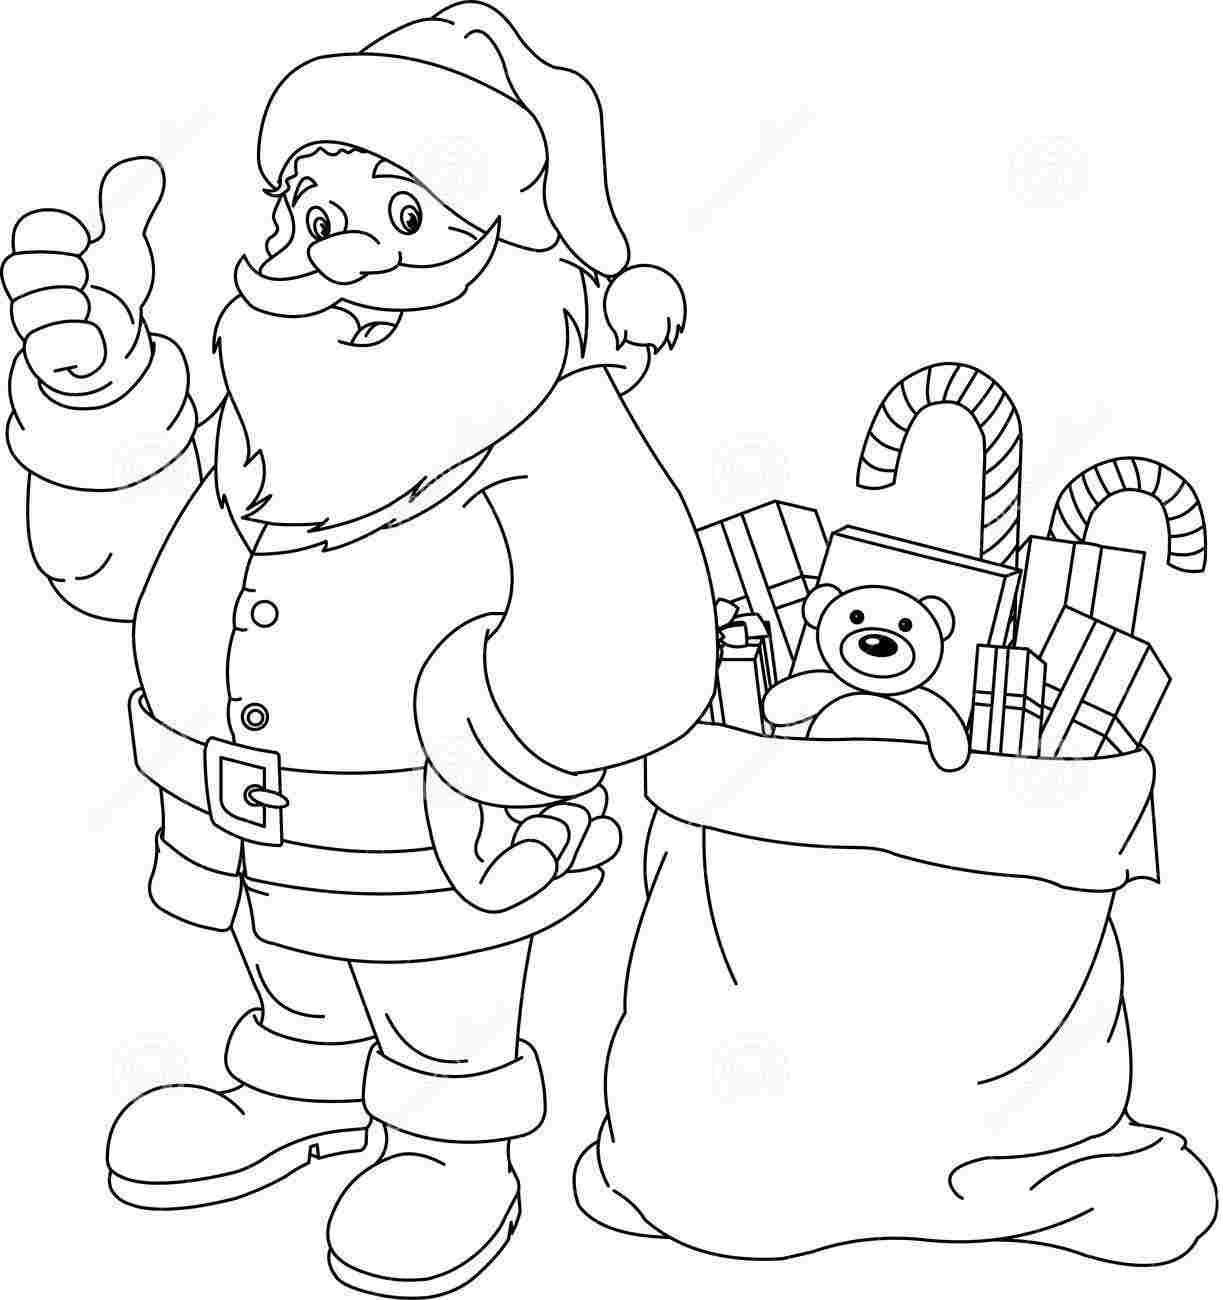 santa claus coloring pages 01 - Santa Claus Coloring Page